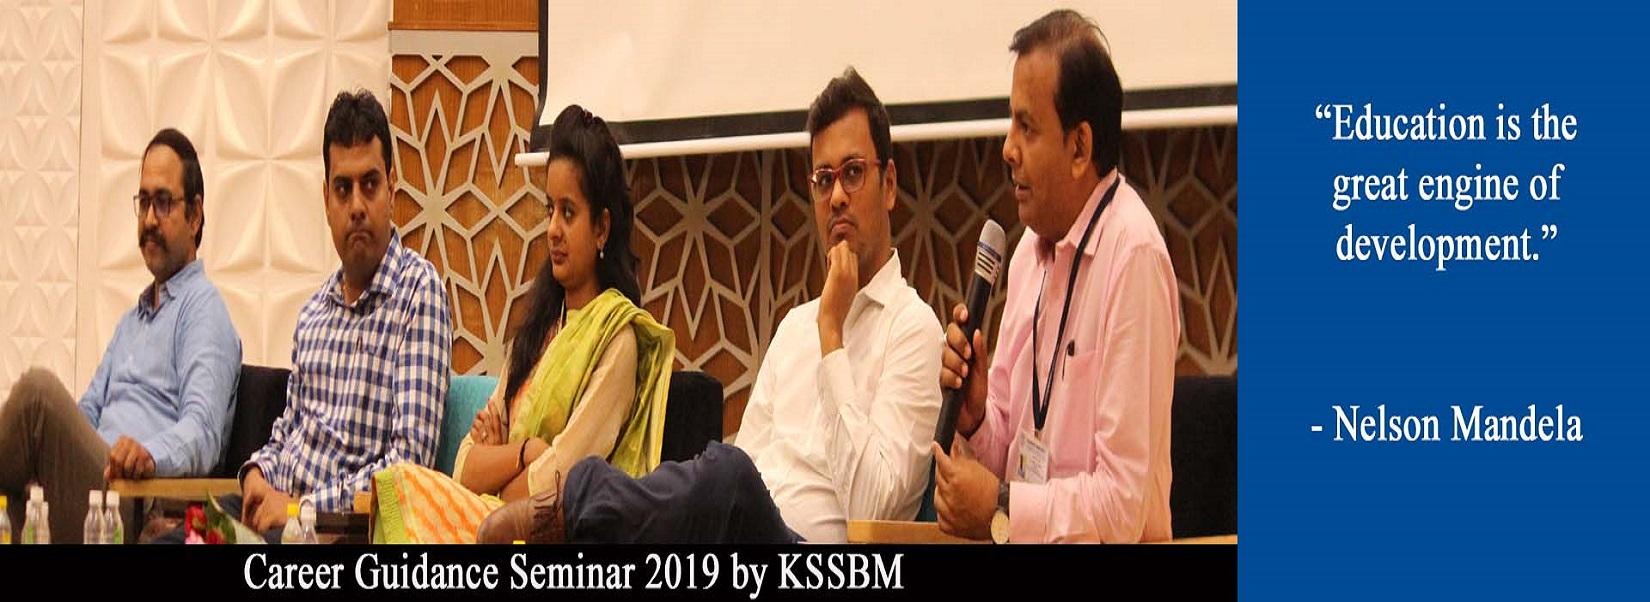 K S SCHOOL OF BUSINESS MANAGEMENT